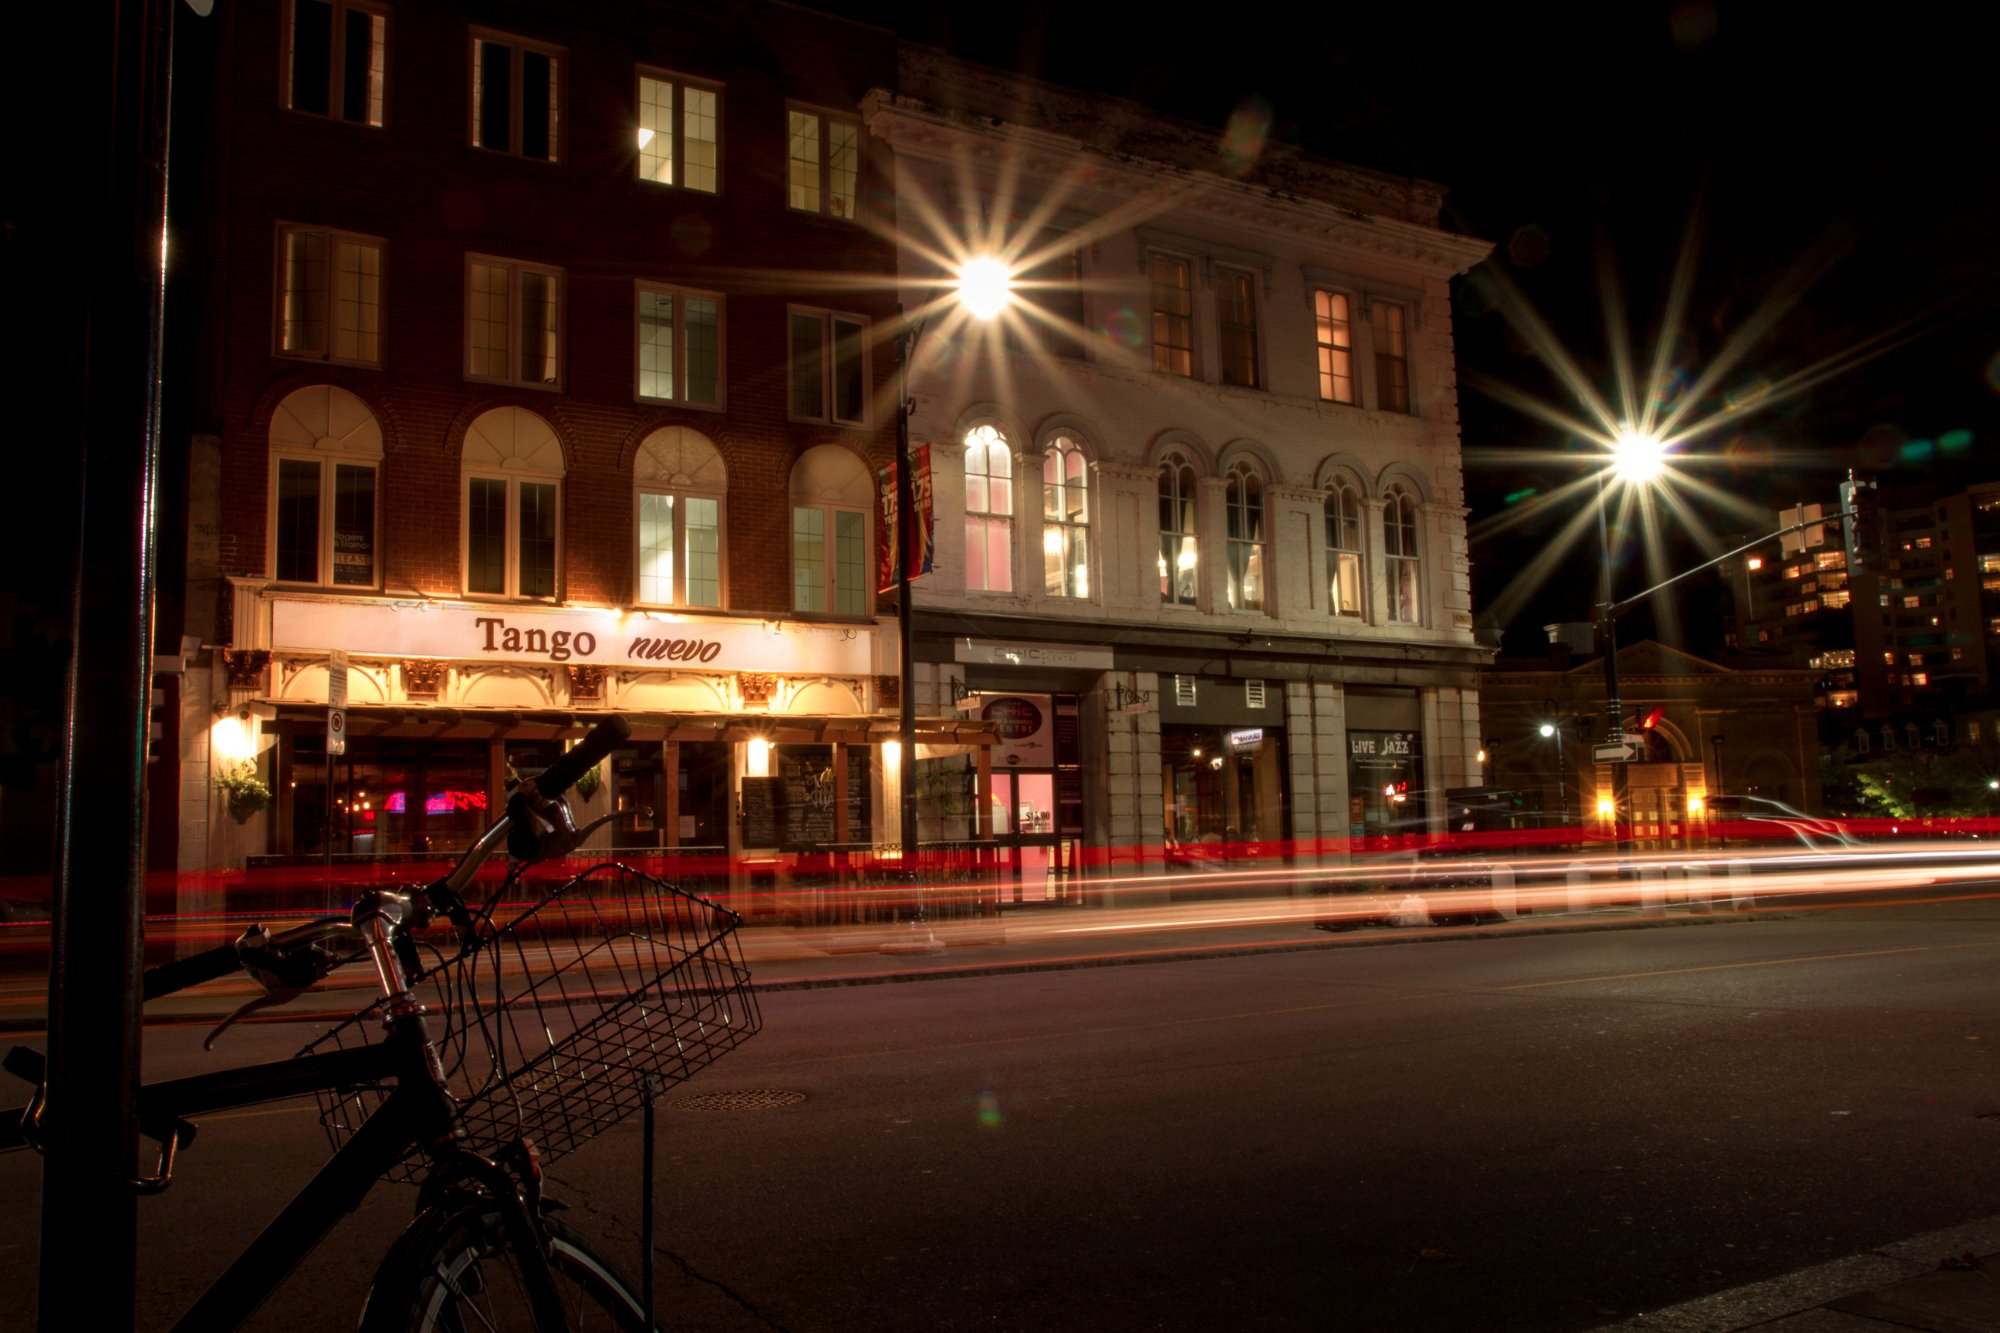 The 10 Best Restaurants Near Kingston Waterfront - TripAdvisor